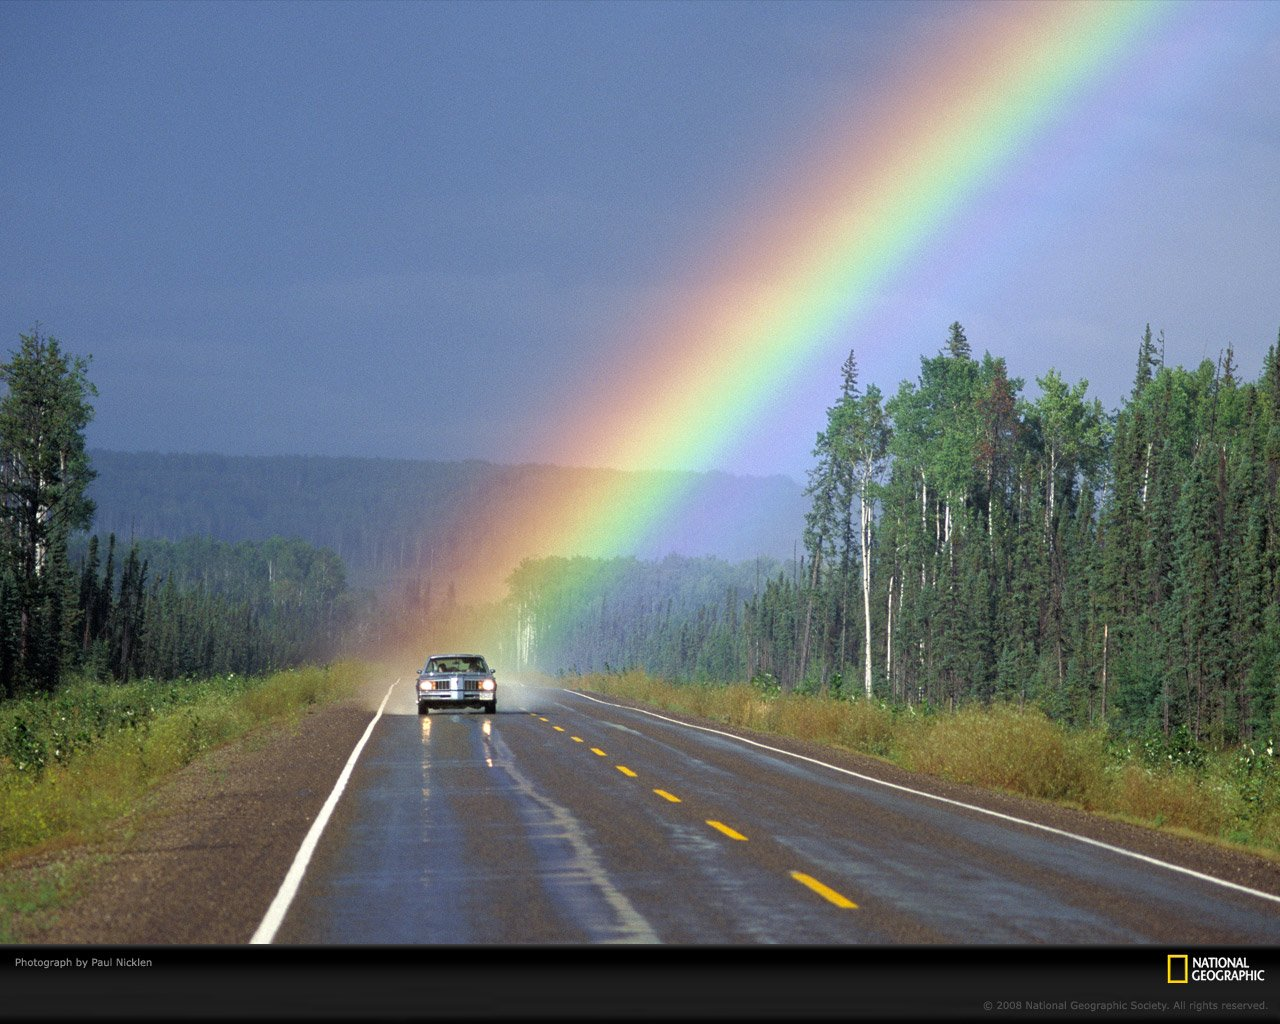 Rainbow Wallpaper From National Geographic Ginva 1280x1024